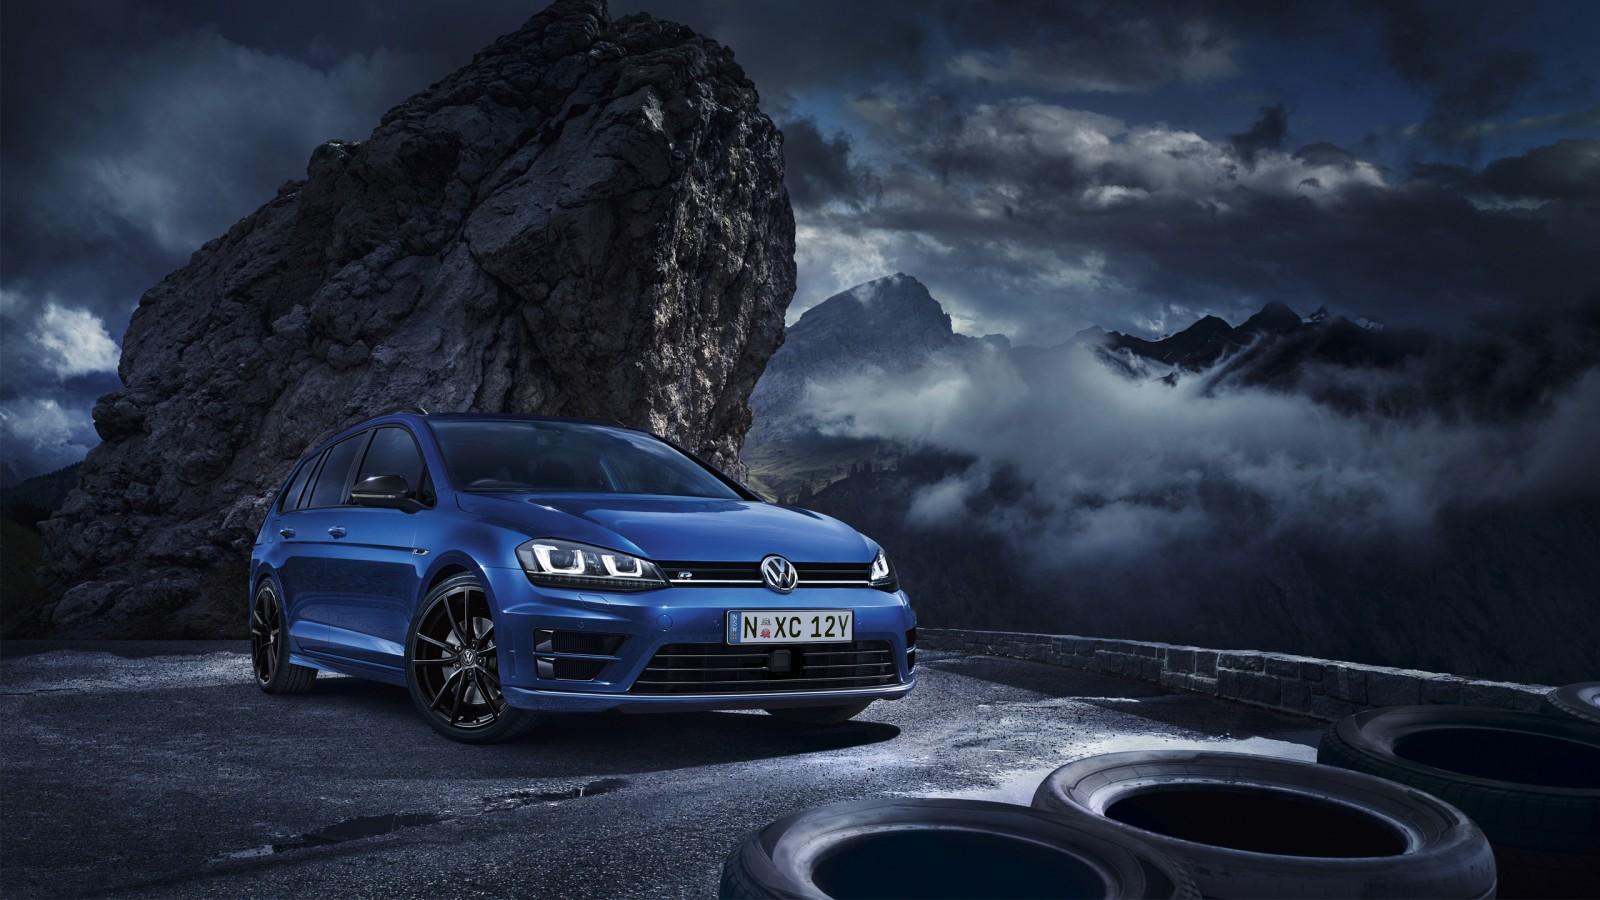 2015 volkswagen golf r wagon wallpaper hd car wallpapers